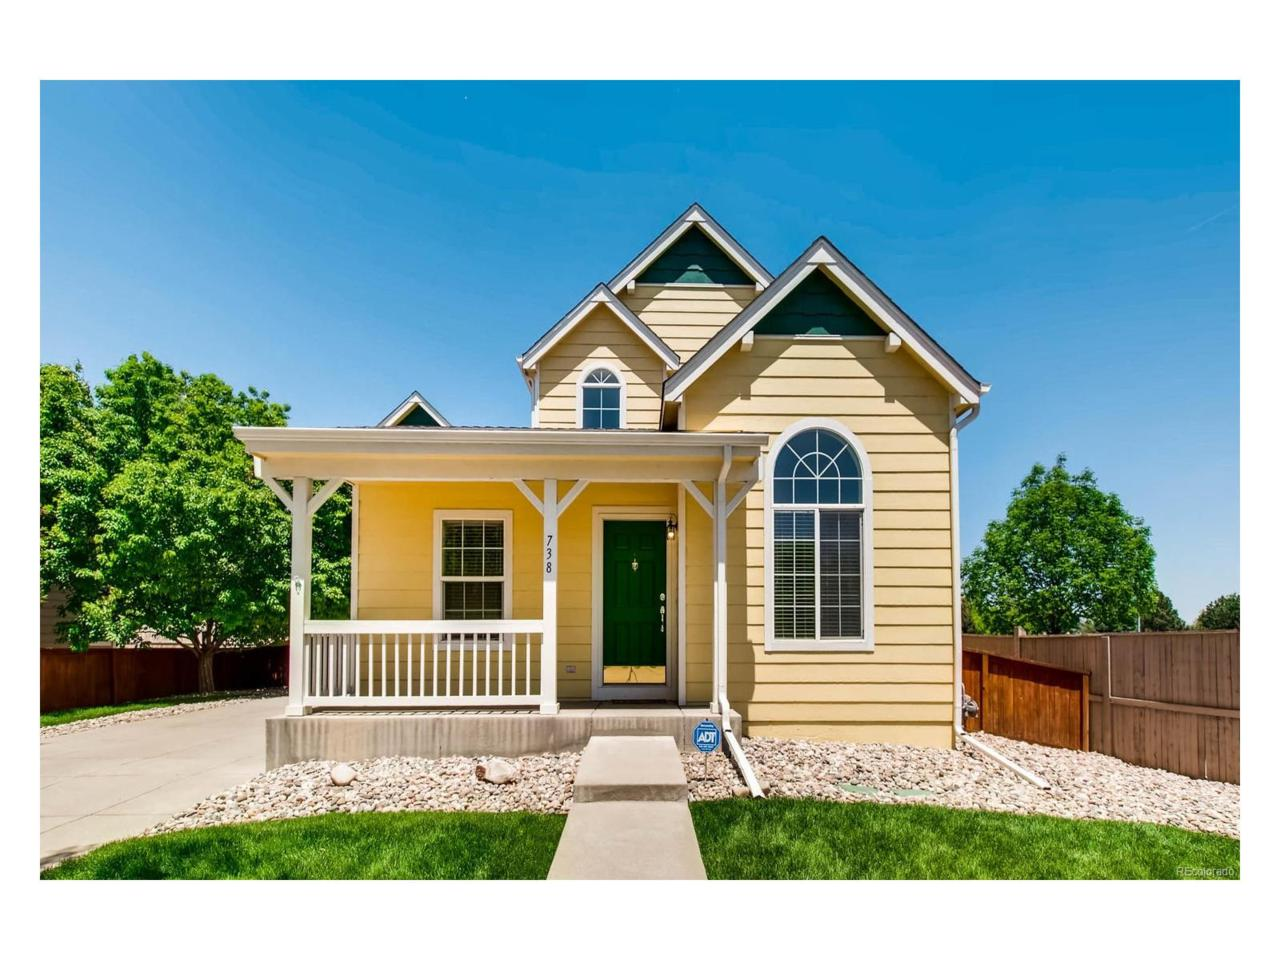 738 Folklore Avenue, Longmont, CO 80504 (MLS #5188600) :: 8z Real Estate